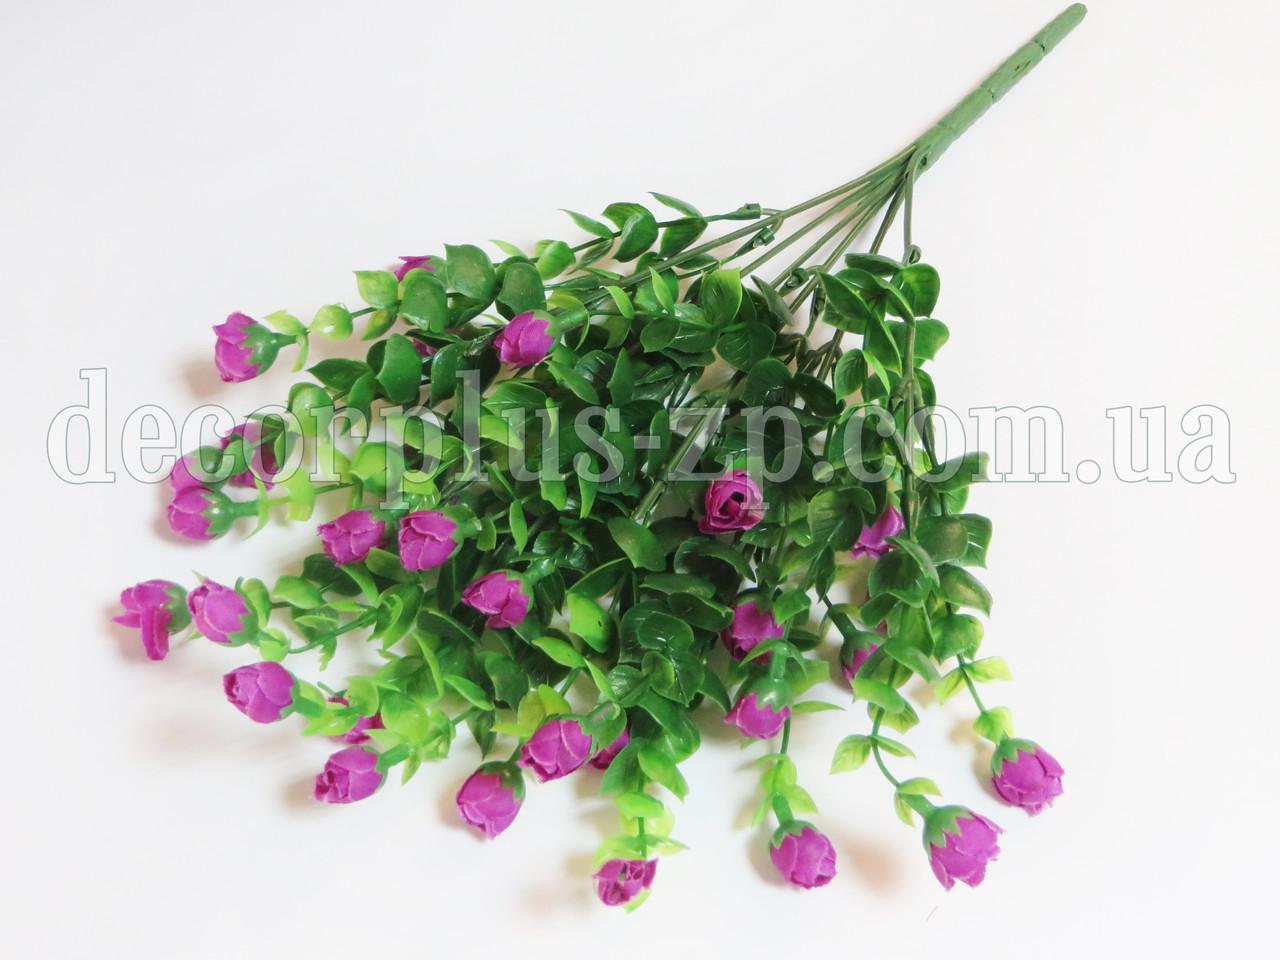 Куст, цветущей зелени с бутонами, сиреневый